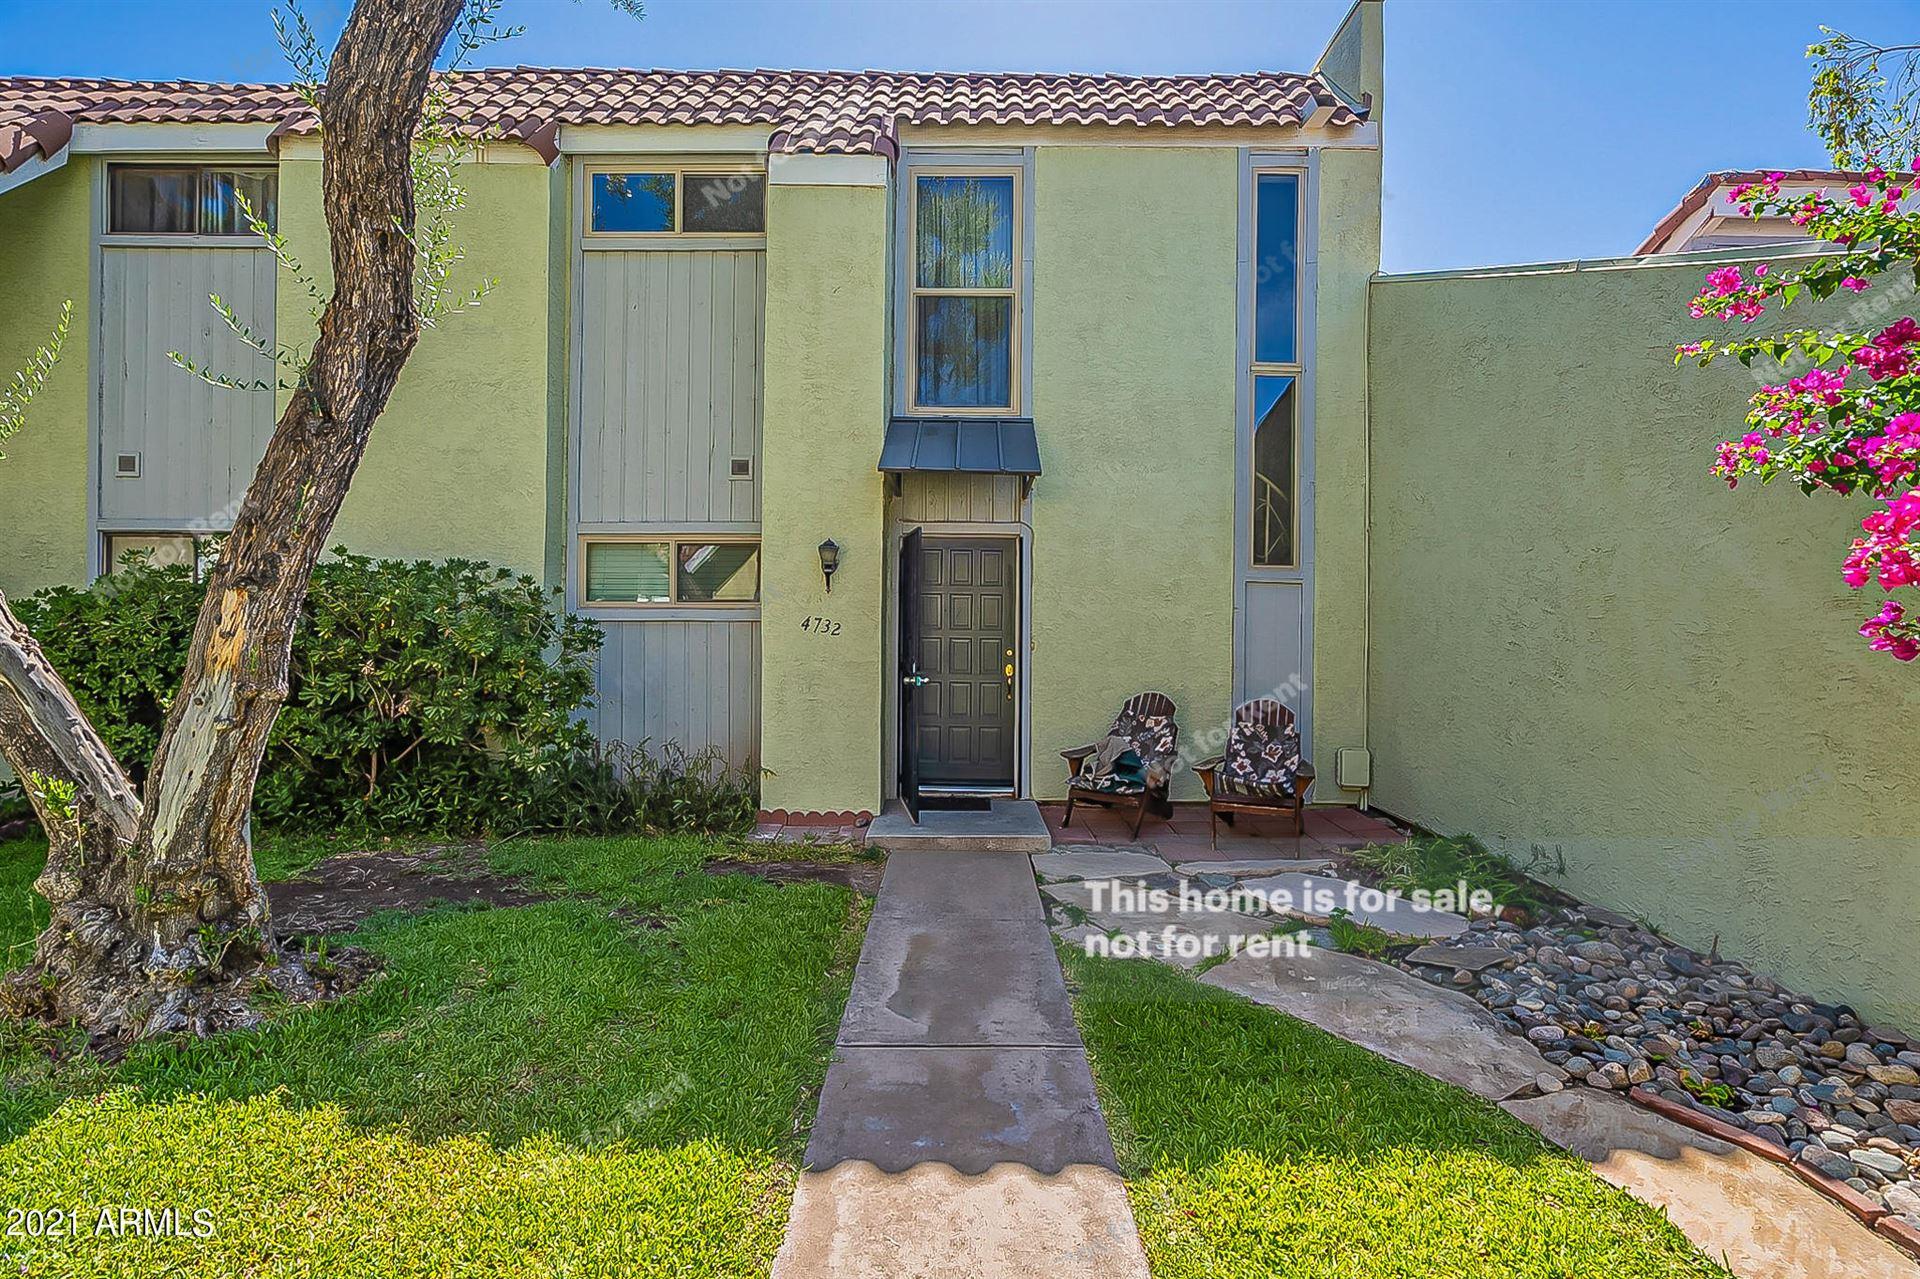 4732 N 10TH Place, Phoenix, AZ 85014 - MLS#: 6262333